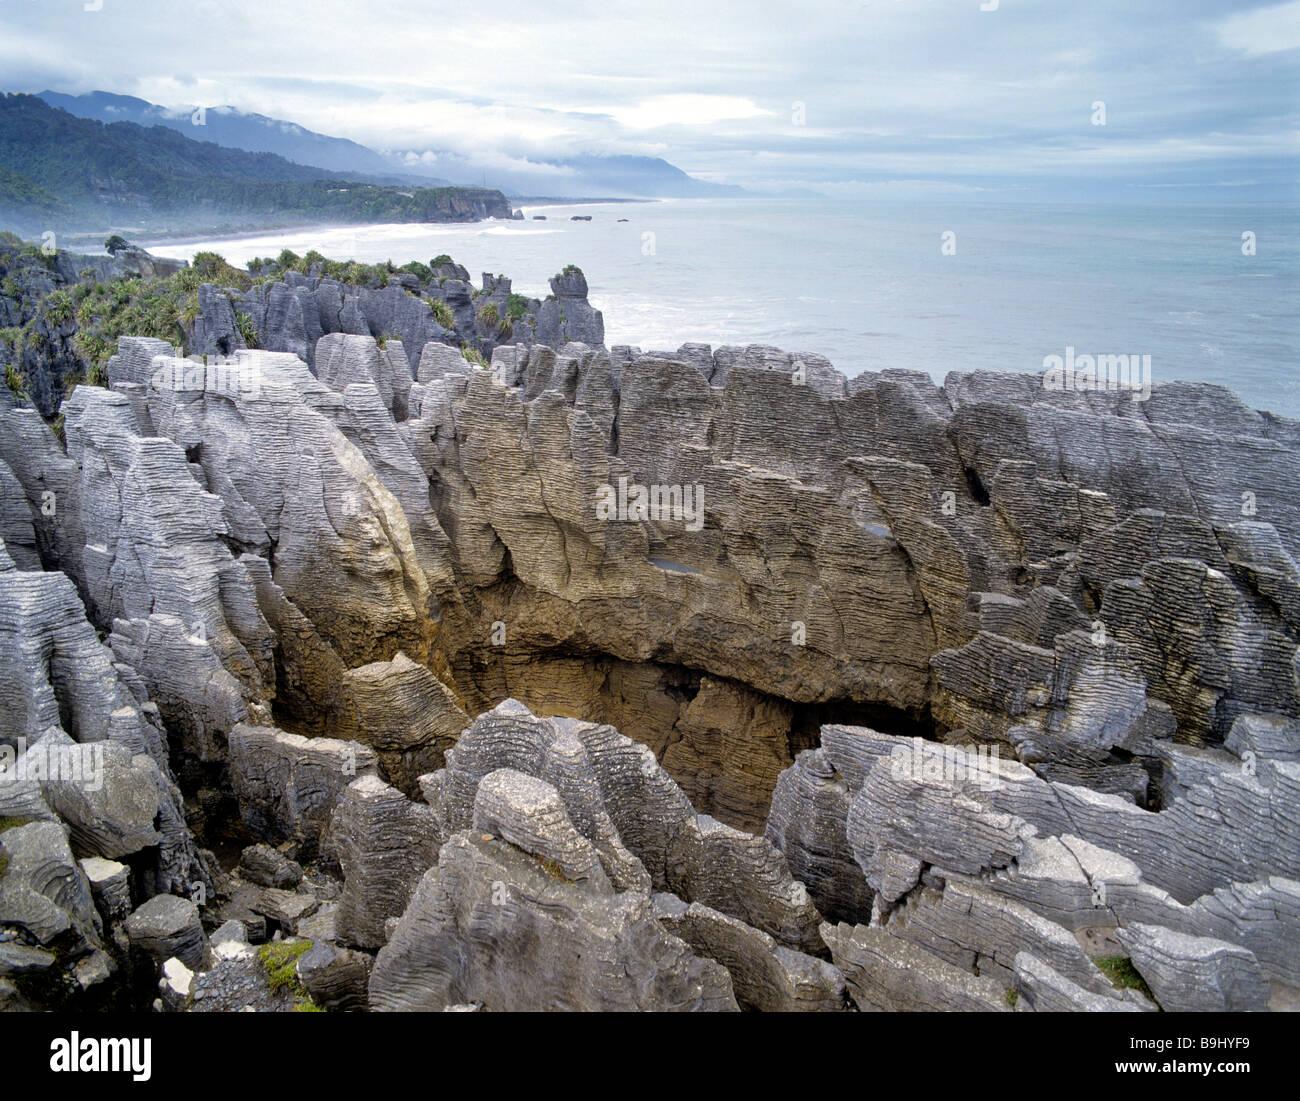 Pancake Rocks, Paparoa National Park, Punakaiki, South Island, New Zealand - Stock Image